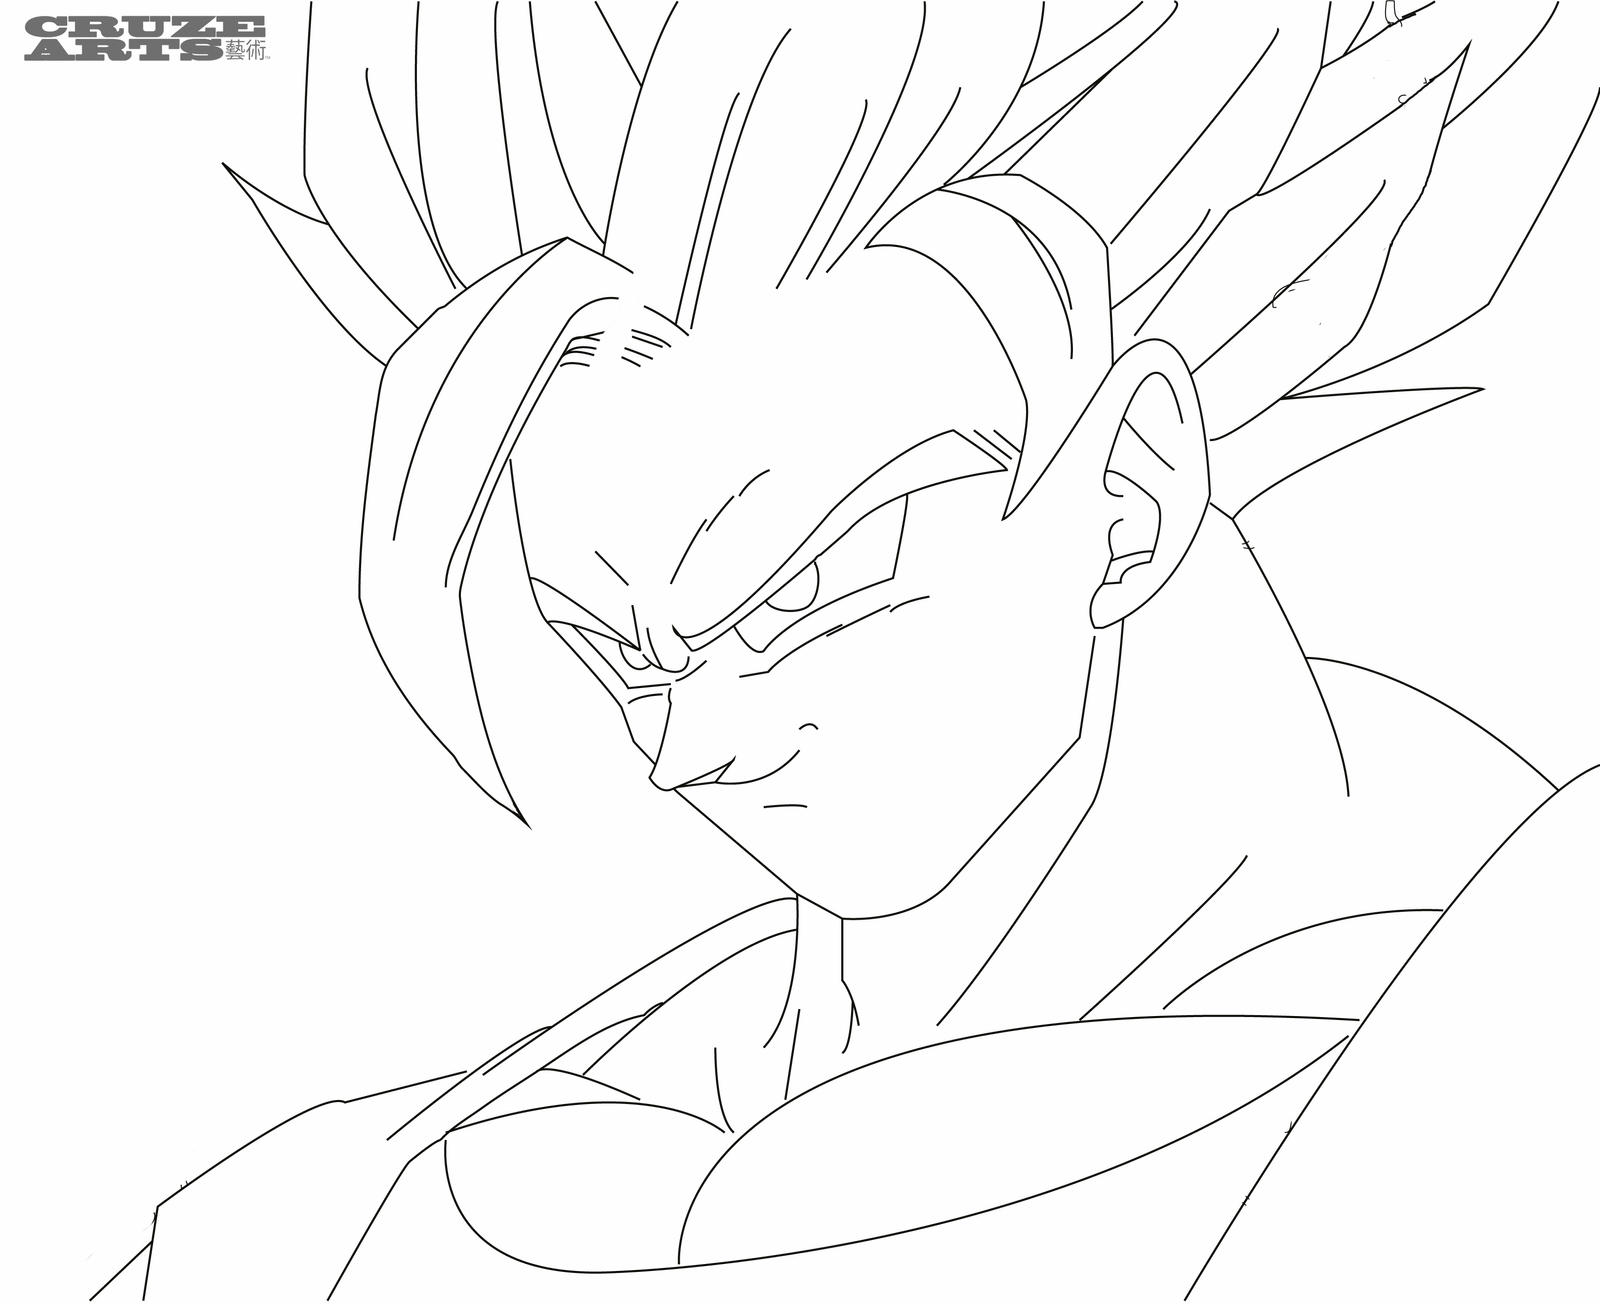 Dragon Ball Z Para Colorir Gohan Super Ssj 2: Goku Super Saiyan 2 Line Work By Cruzemissile On DeviantArt